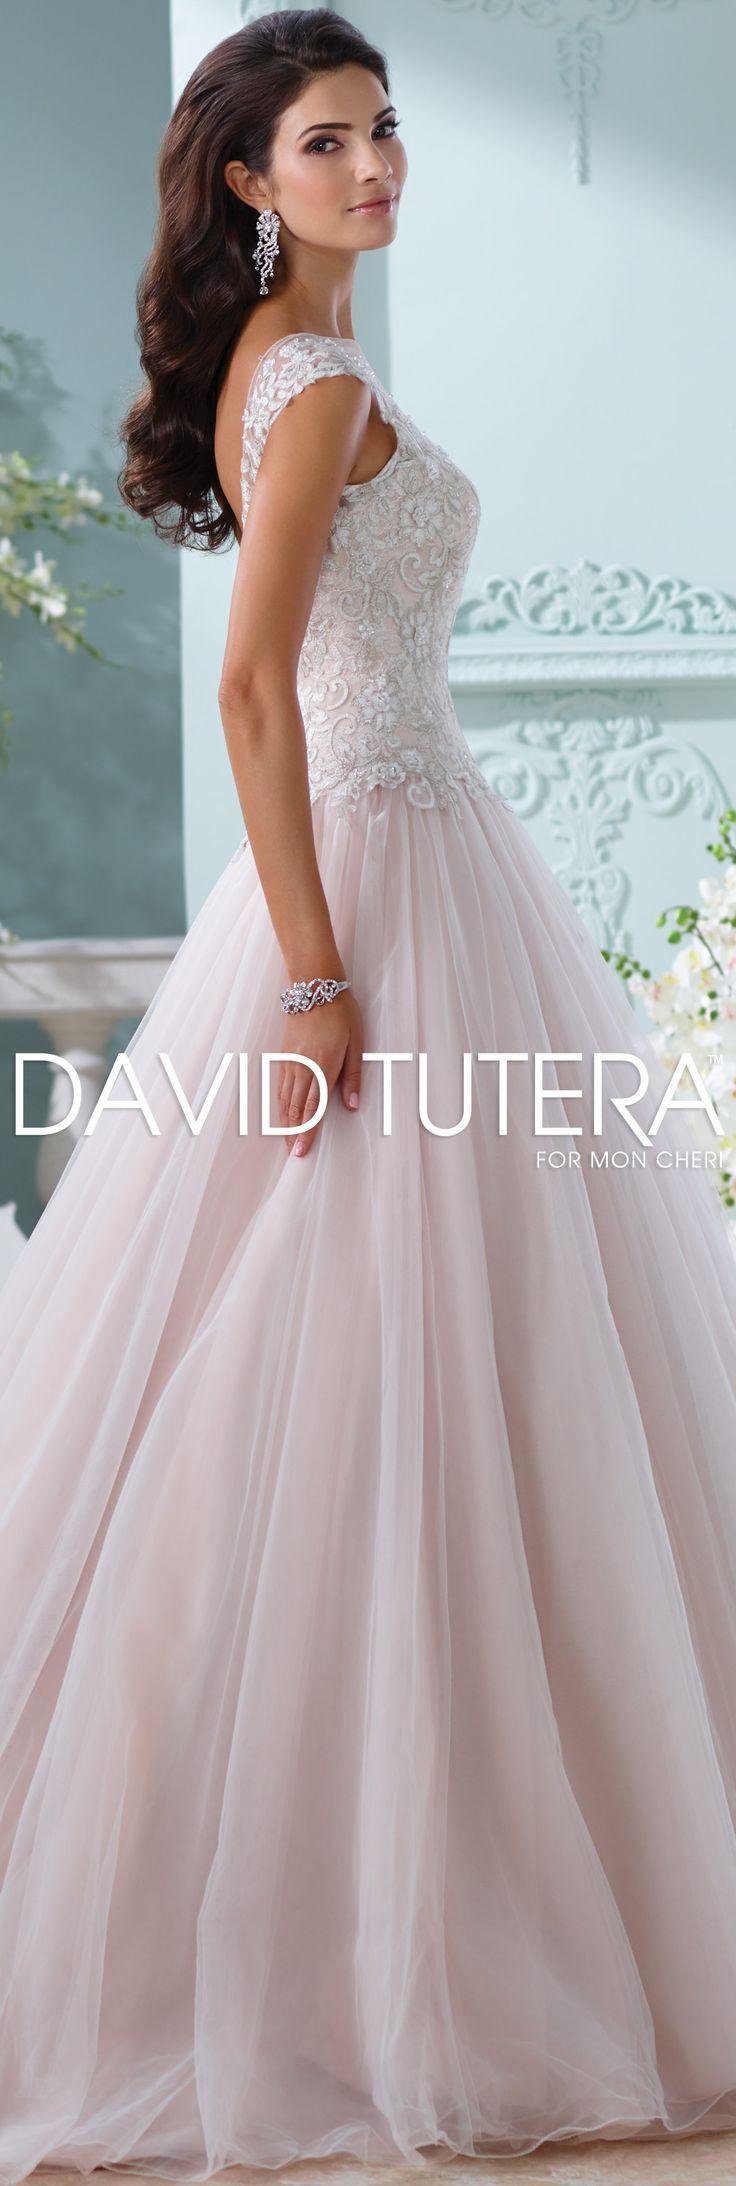 The David Tutera for Mon Cheri Spring 2016 Wedding Gown Collection - Style No. 116203 Idalia @moncheribridals #tulleandlaceweddingdresses